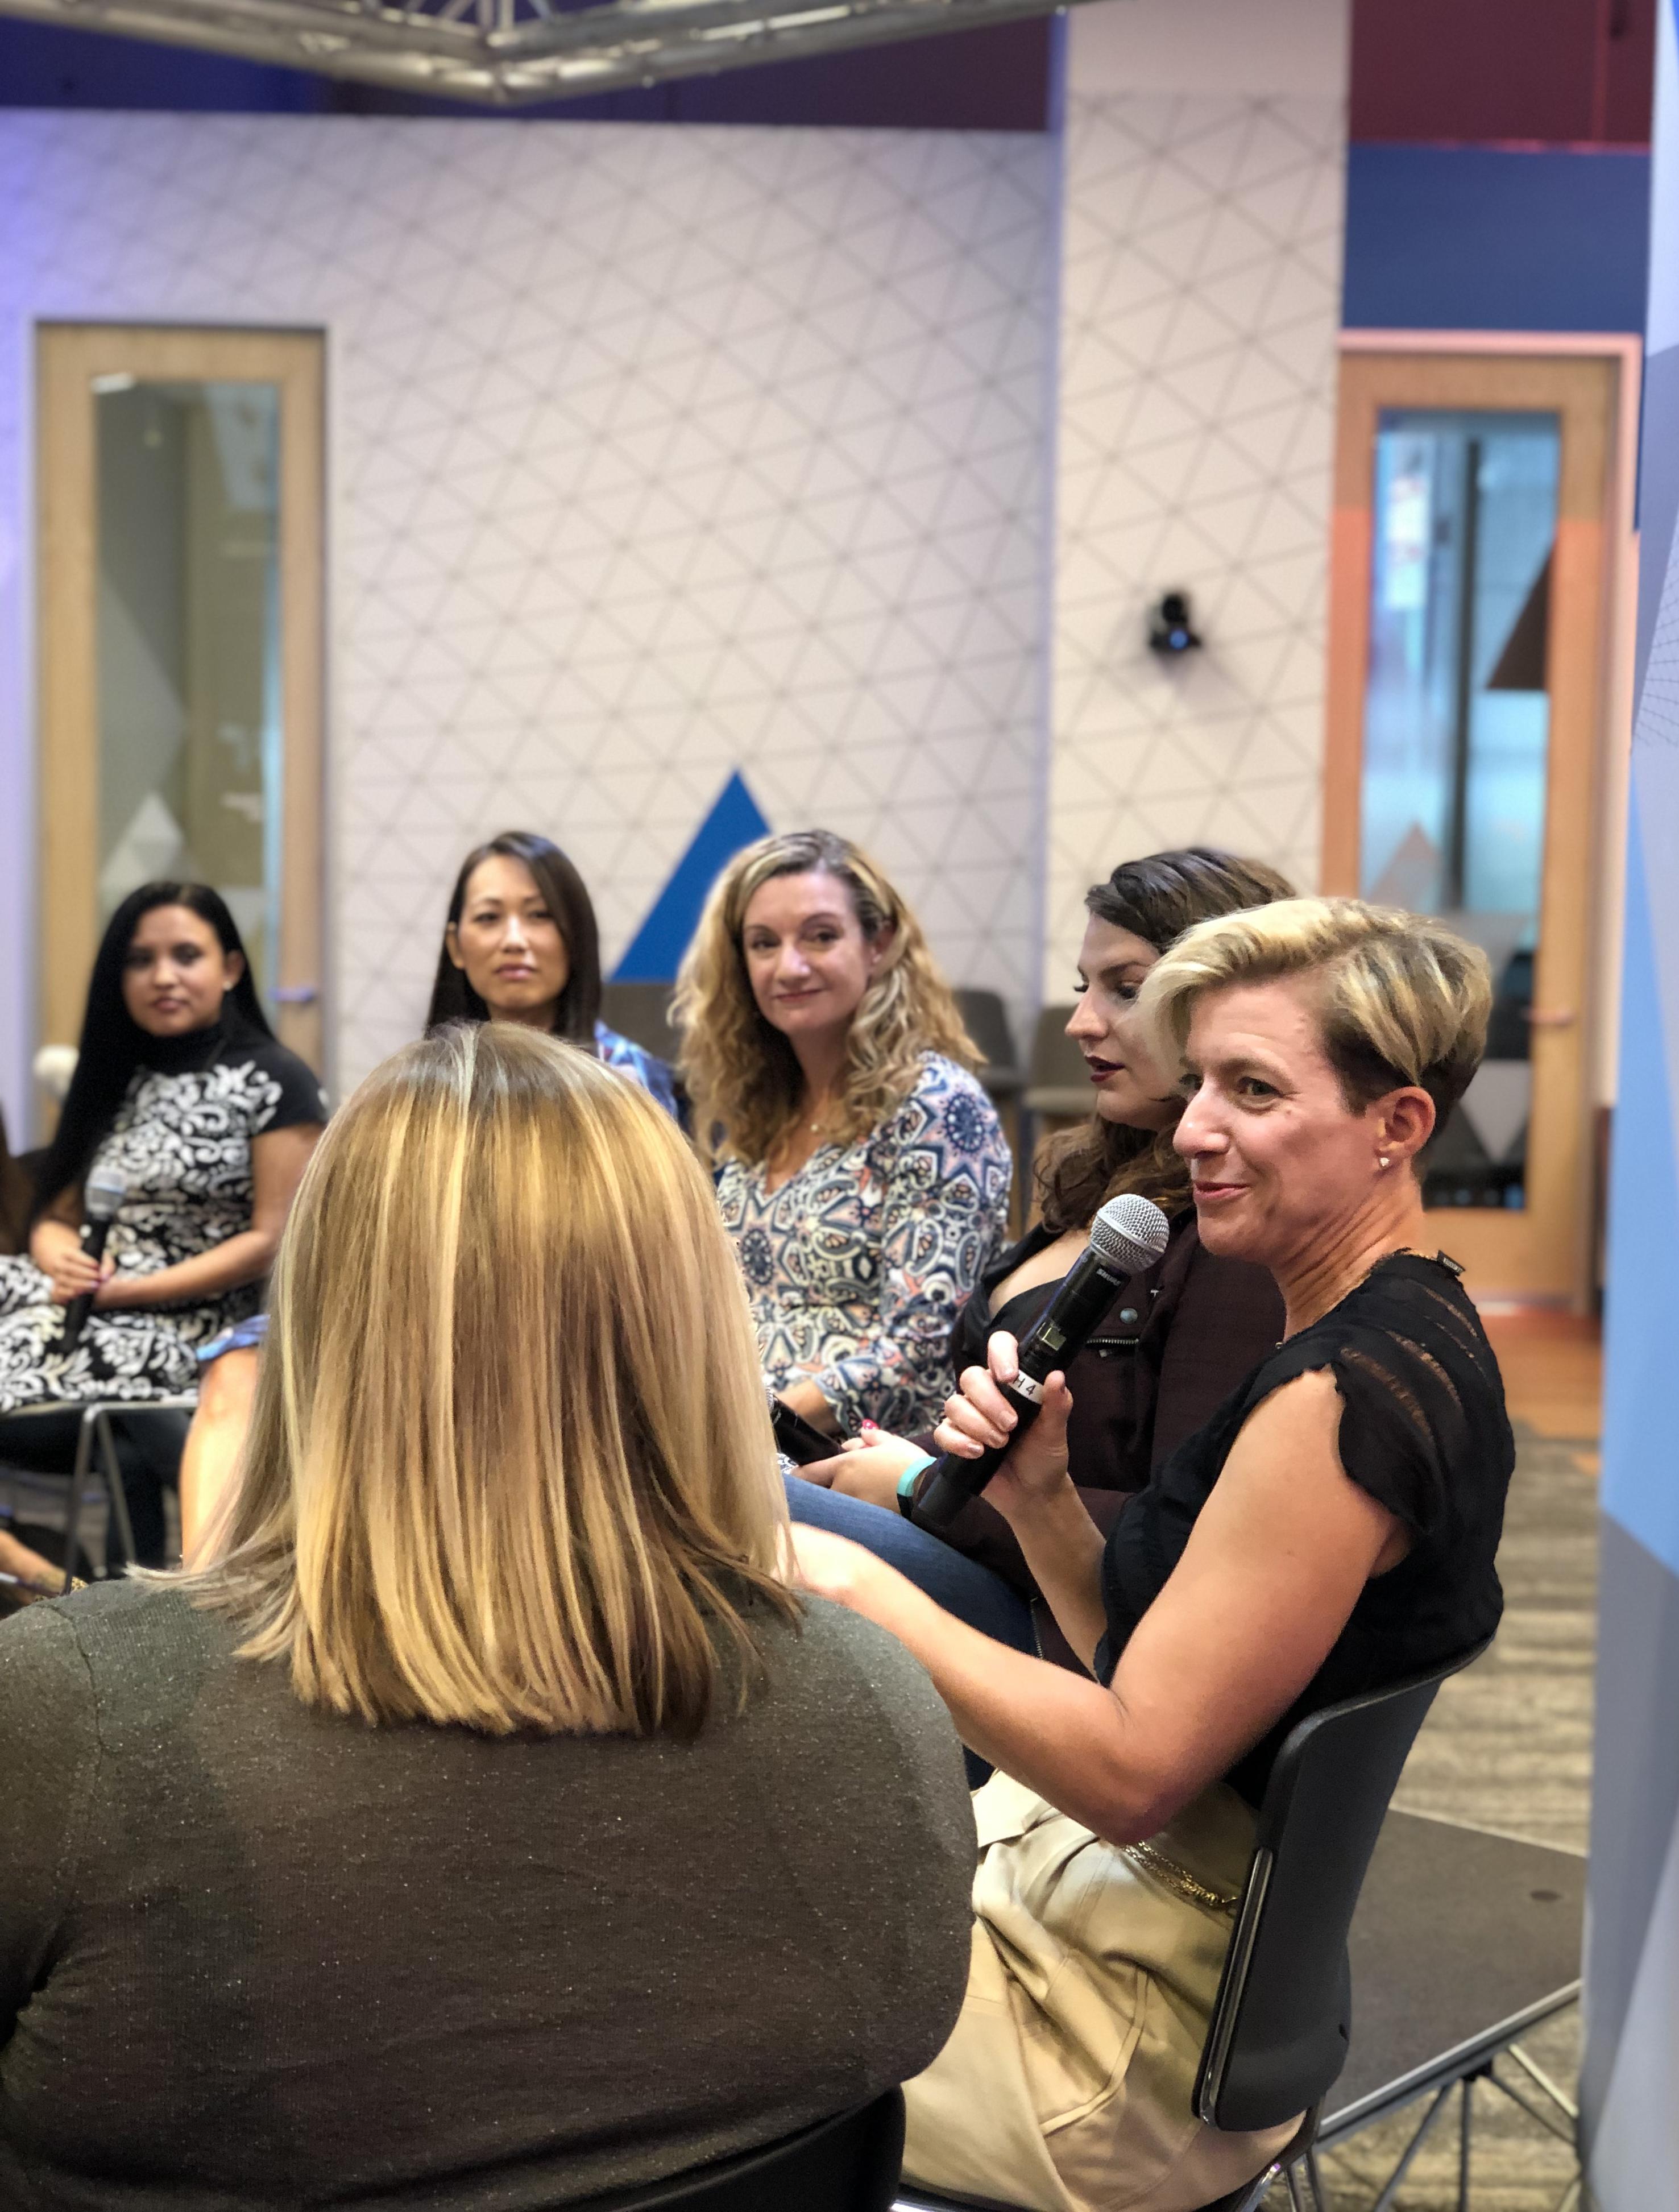 Liza Hausman Speaking at Women in Leadership Event